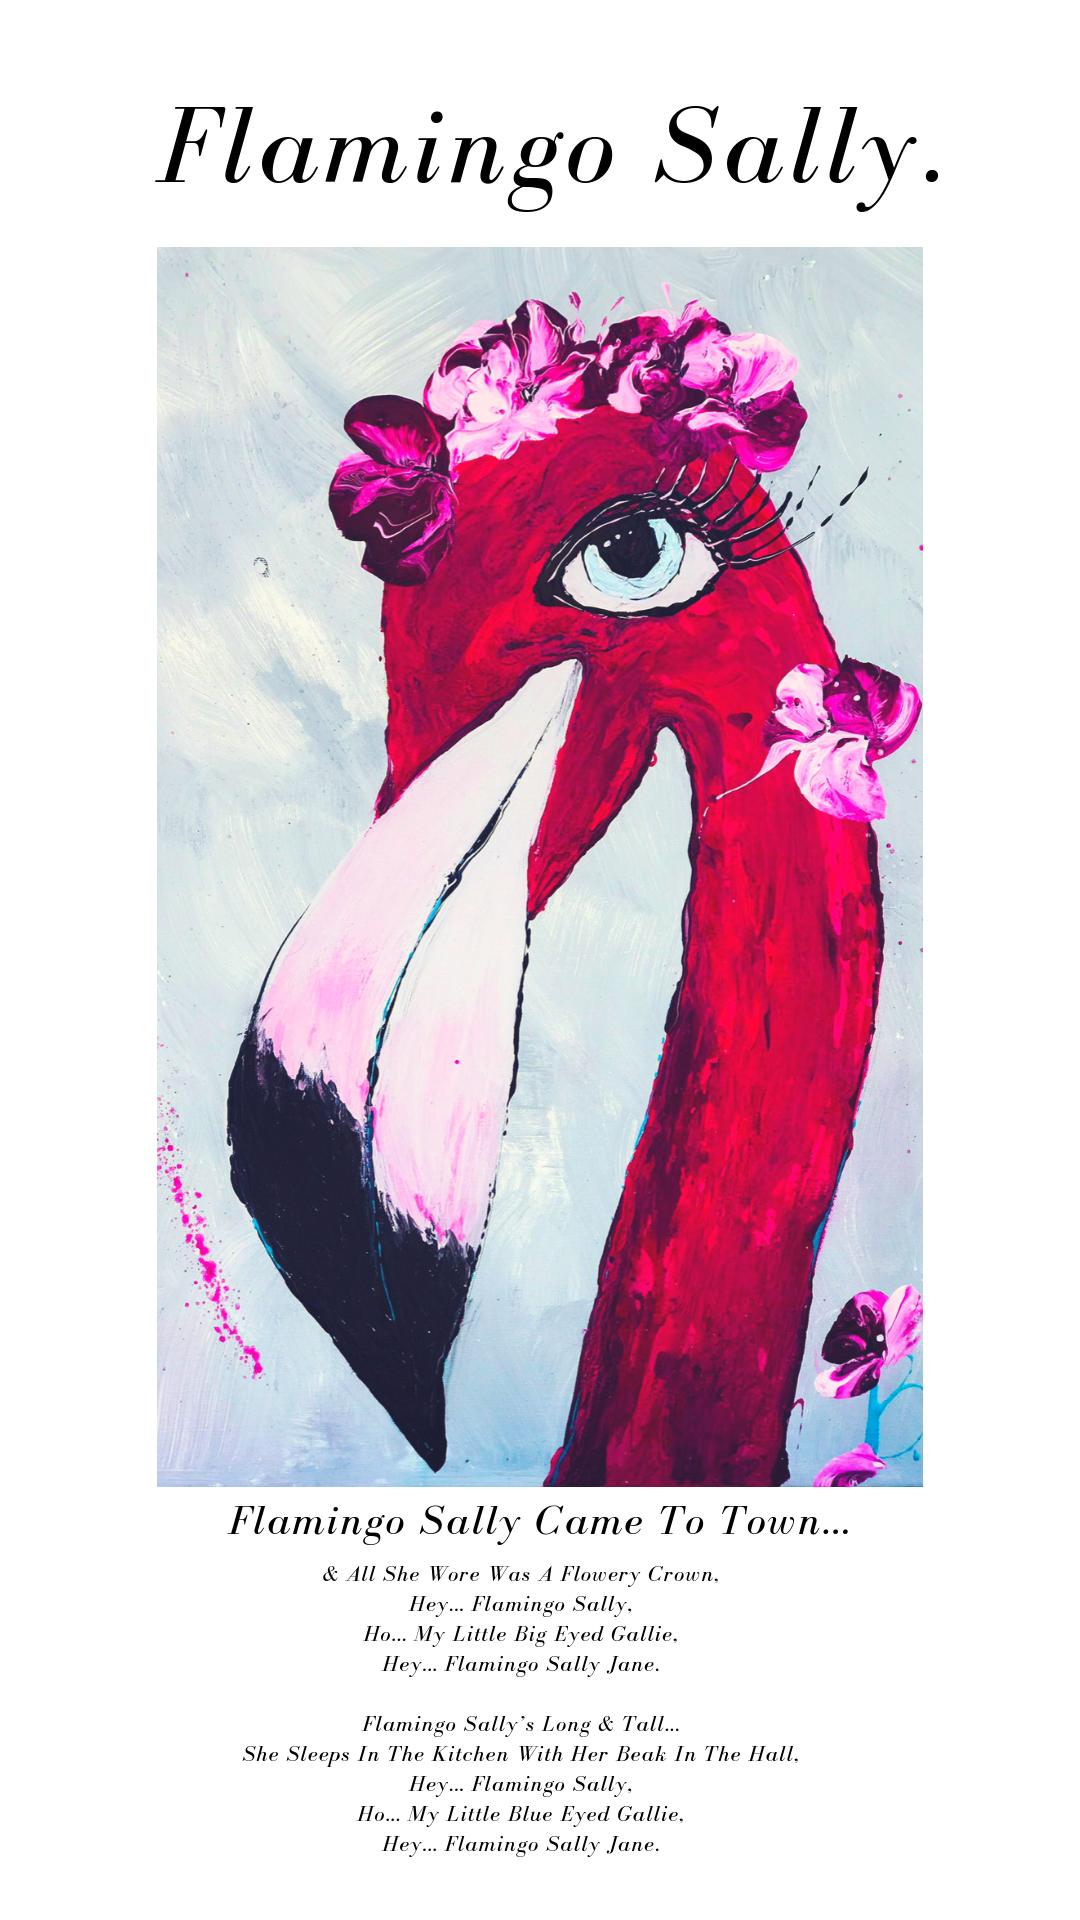 Flamingo Sally.